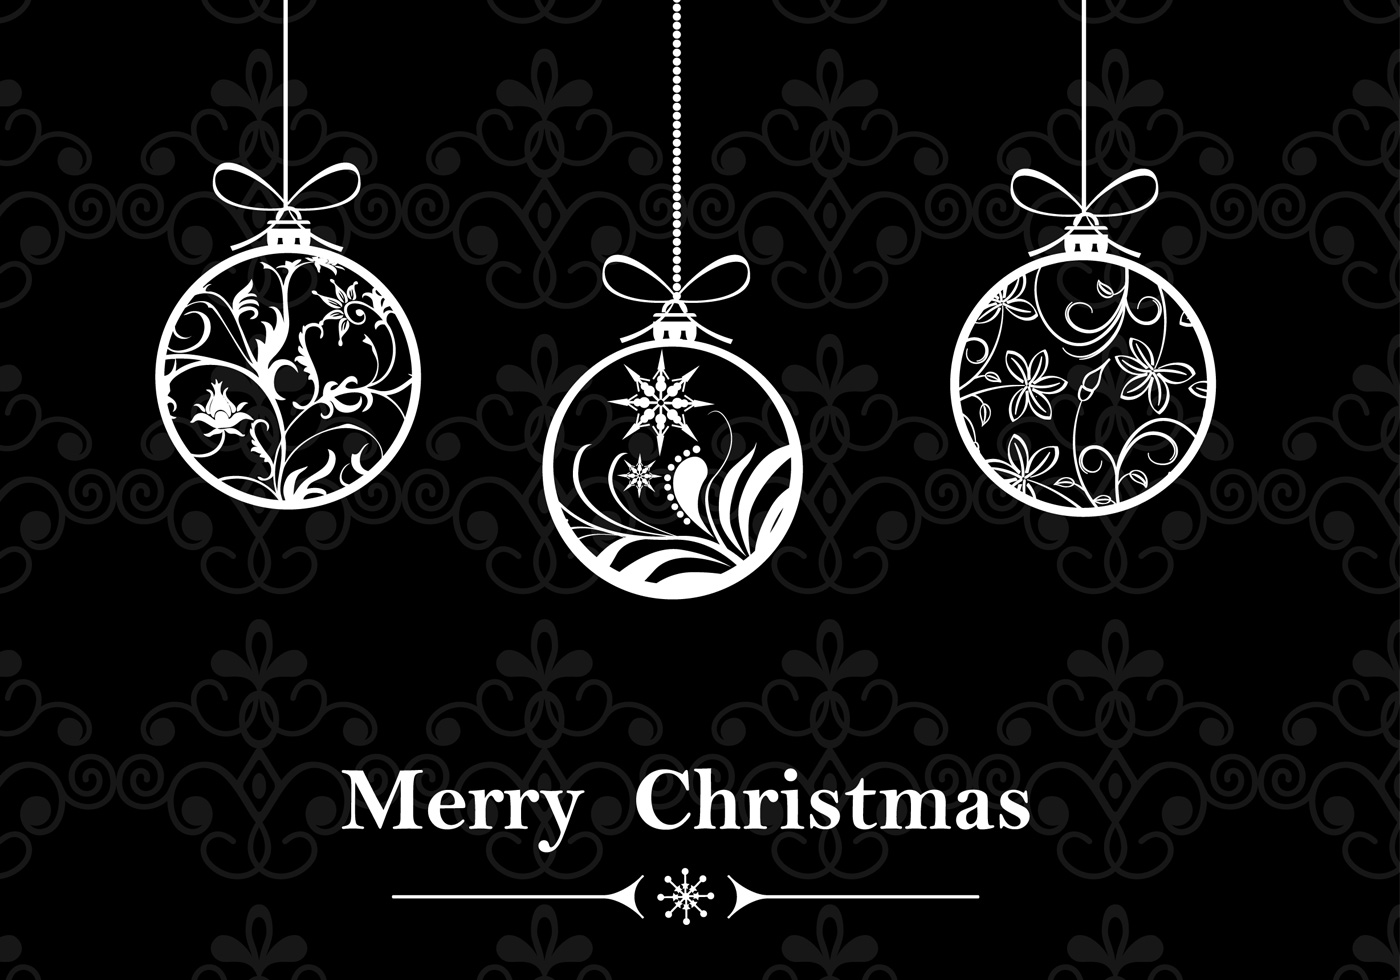 Black White Christmas Ornament Wallpaper Brush And Pattern